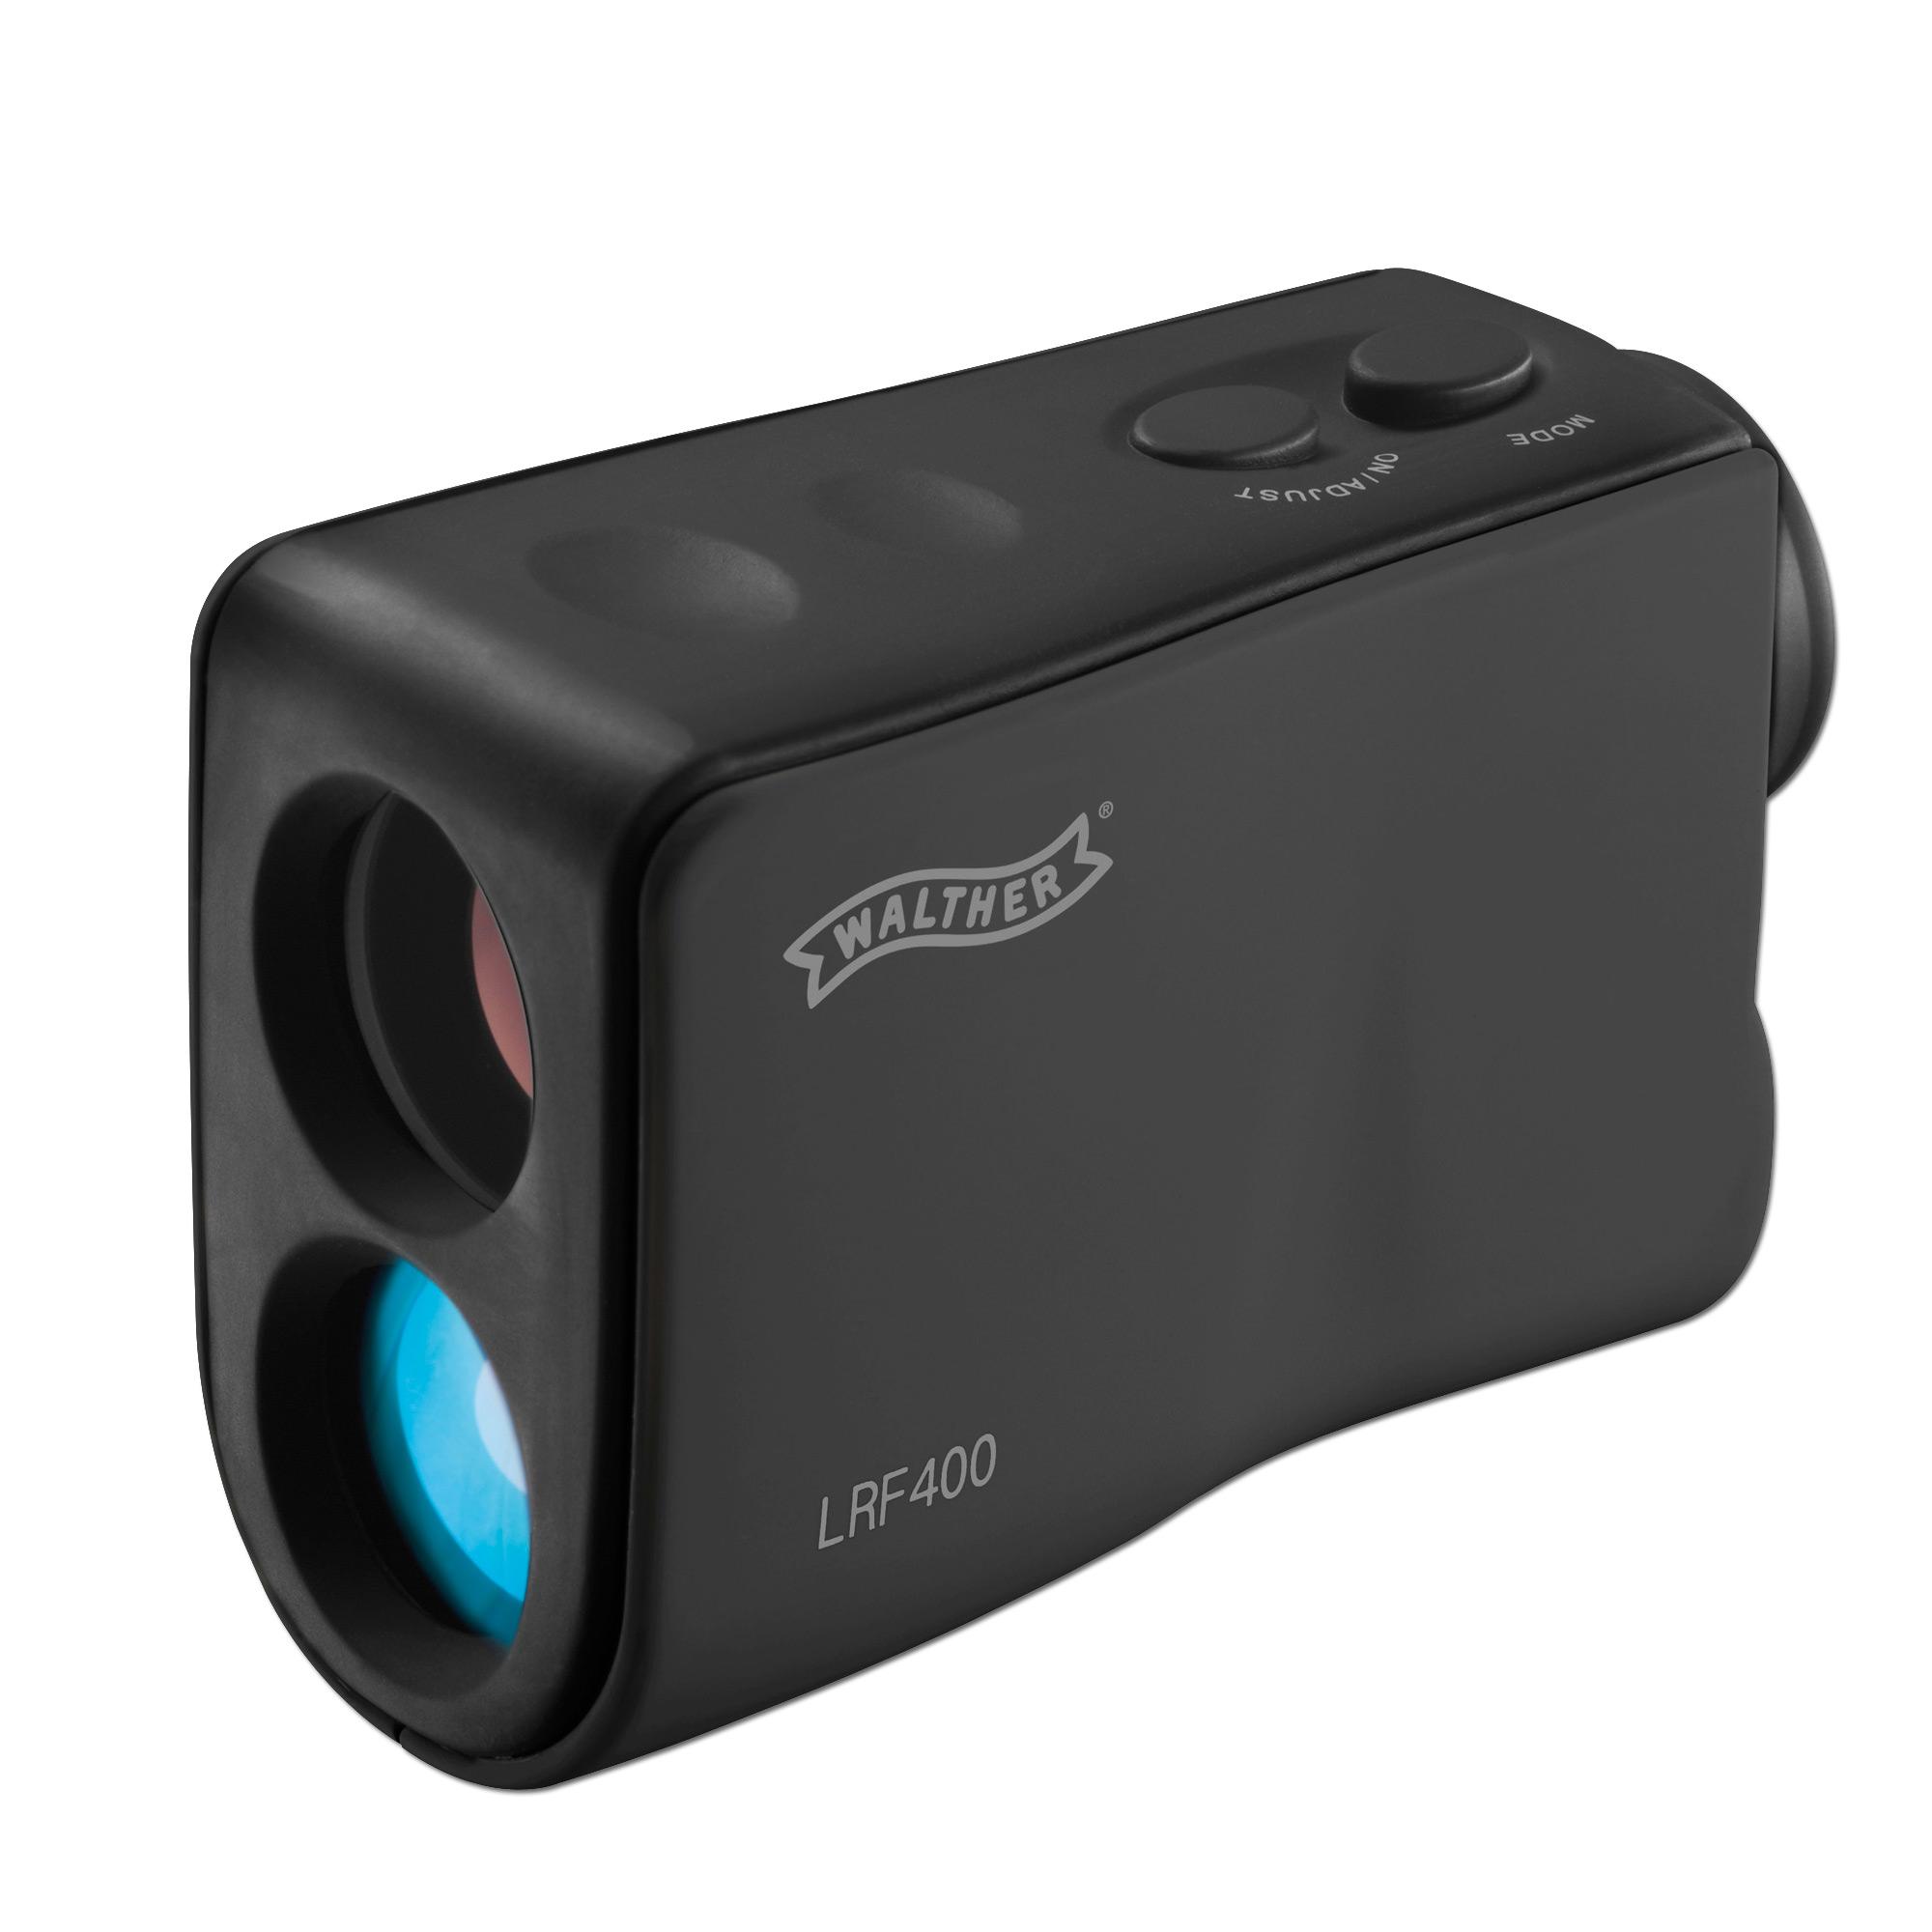 Walther Laser Range Finder LRF 400